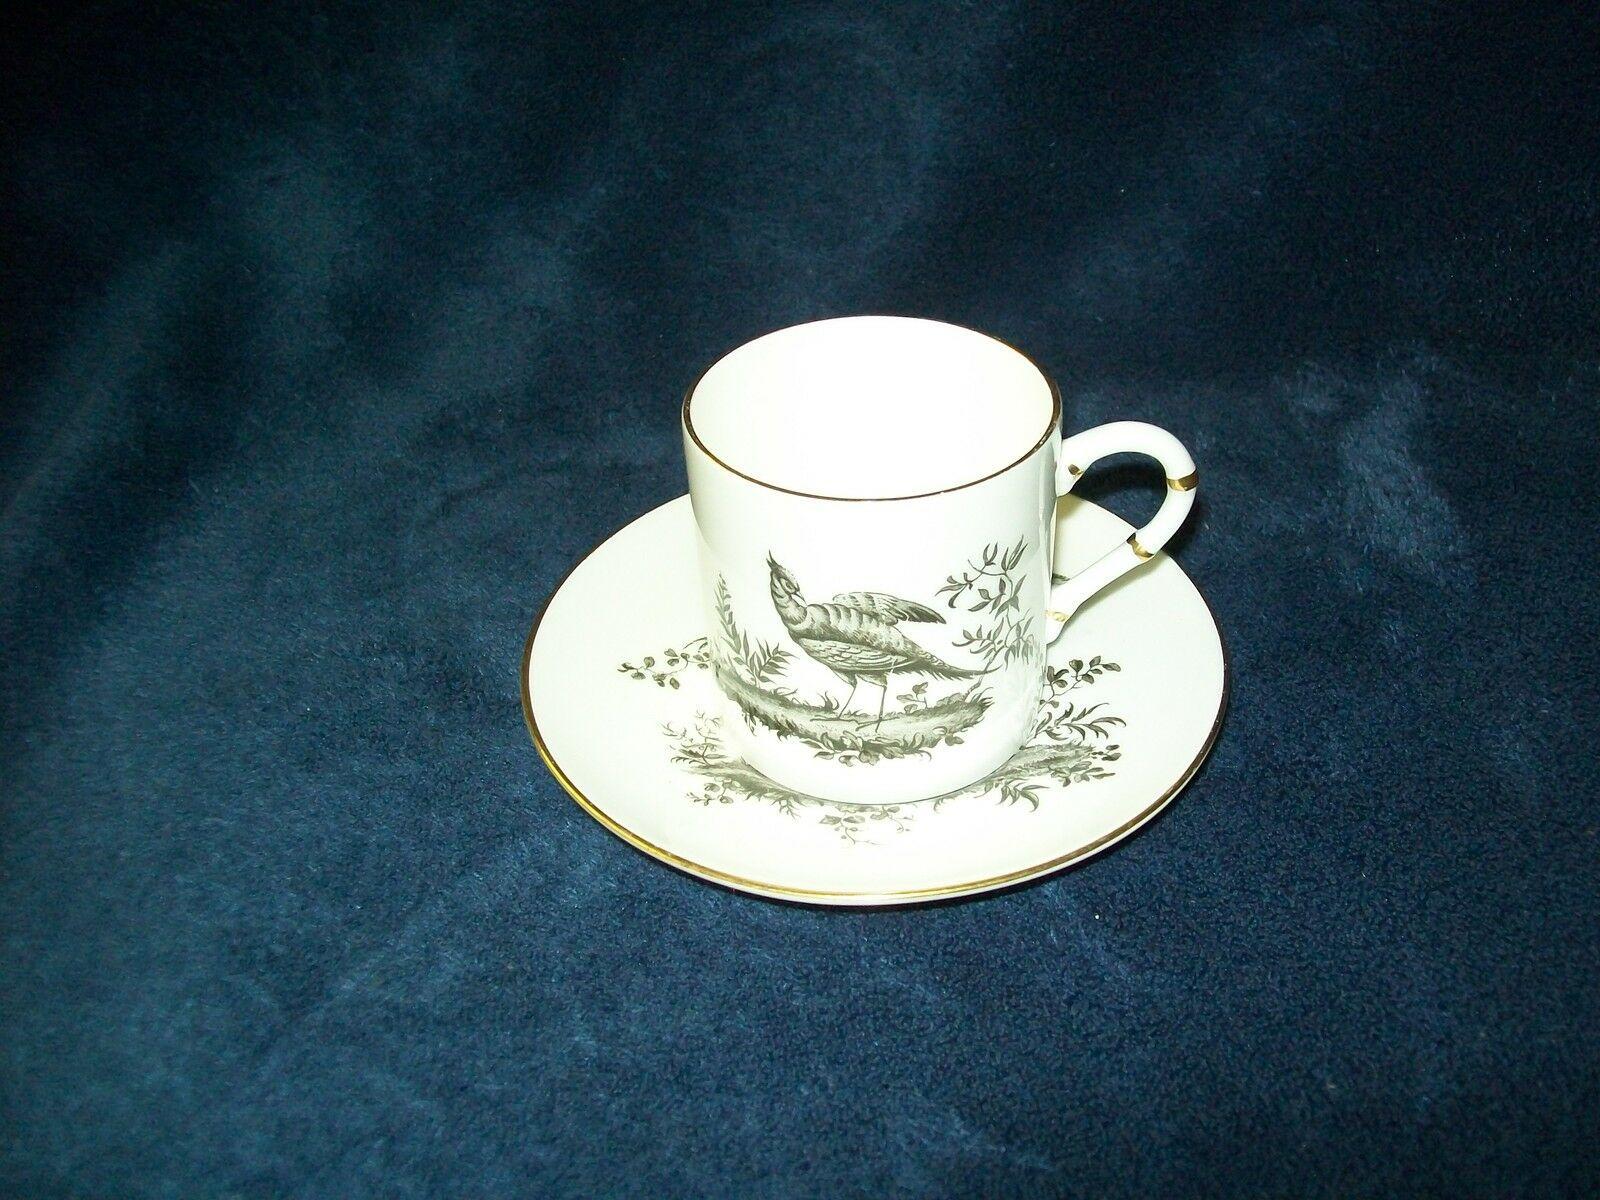 Royal Worcester Black Pheasant Demitasse Cup & Saucer Set s